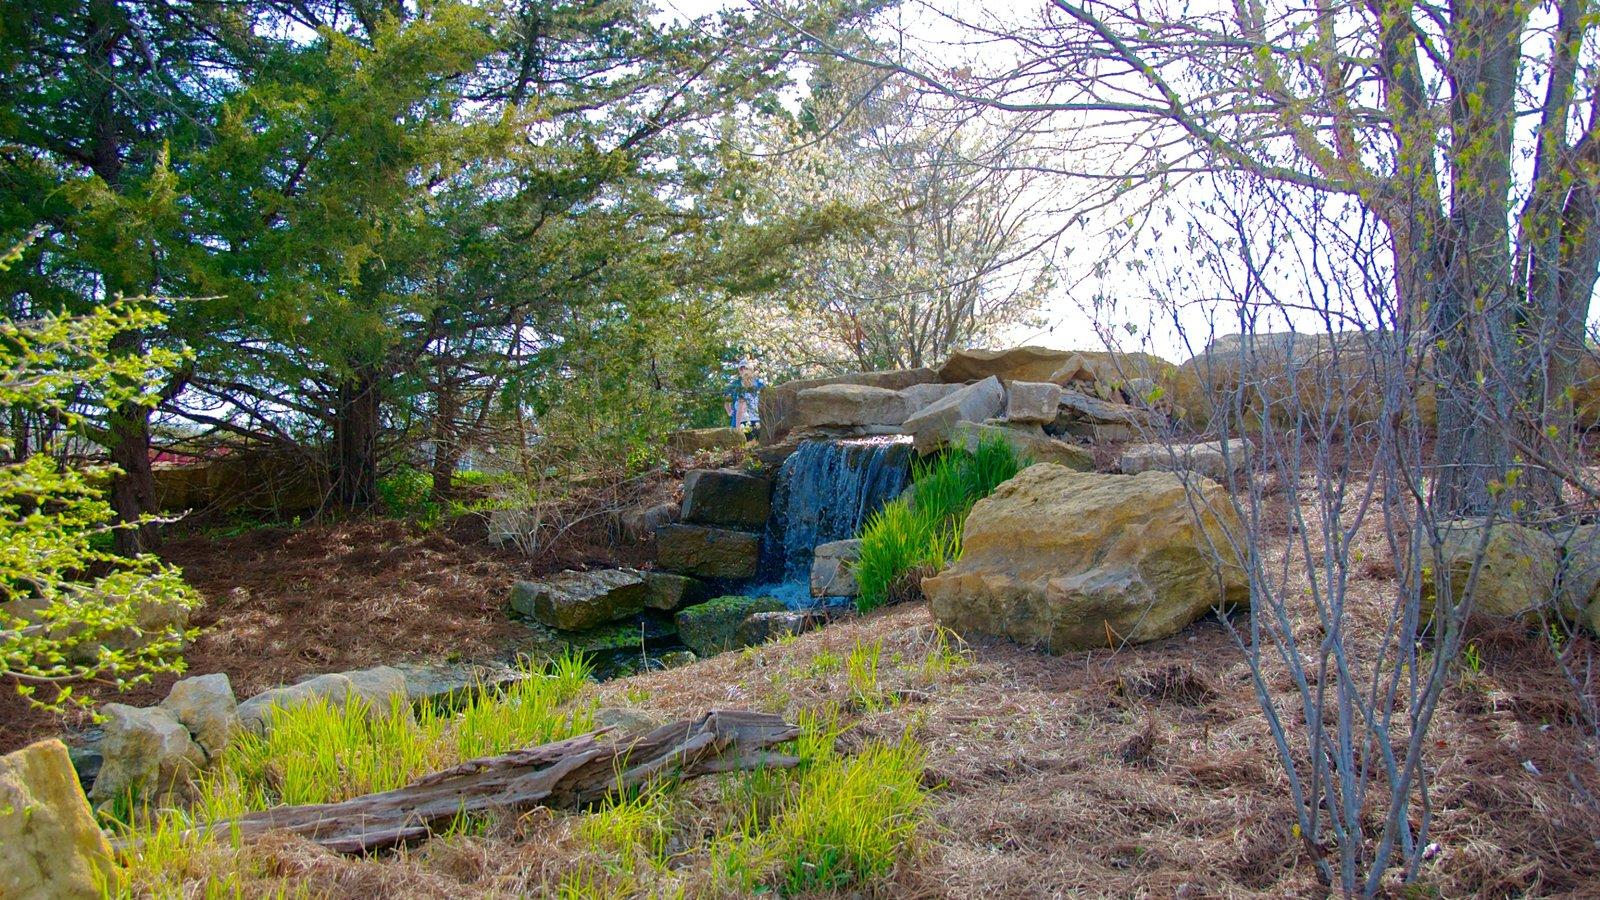 Overland Park Arboretum and Botanical Gardens caracterizando um jardim